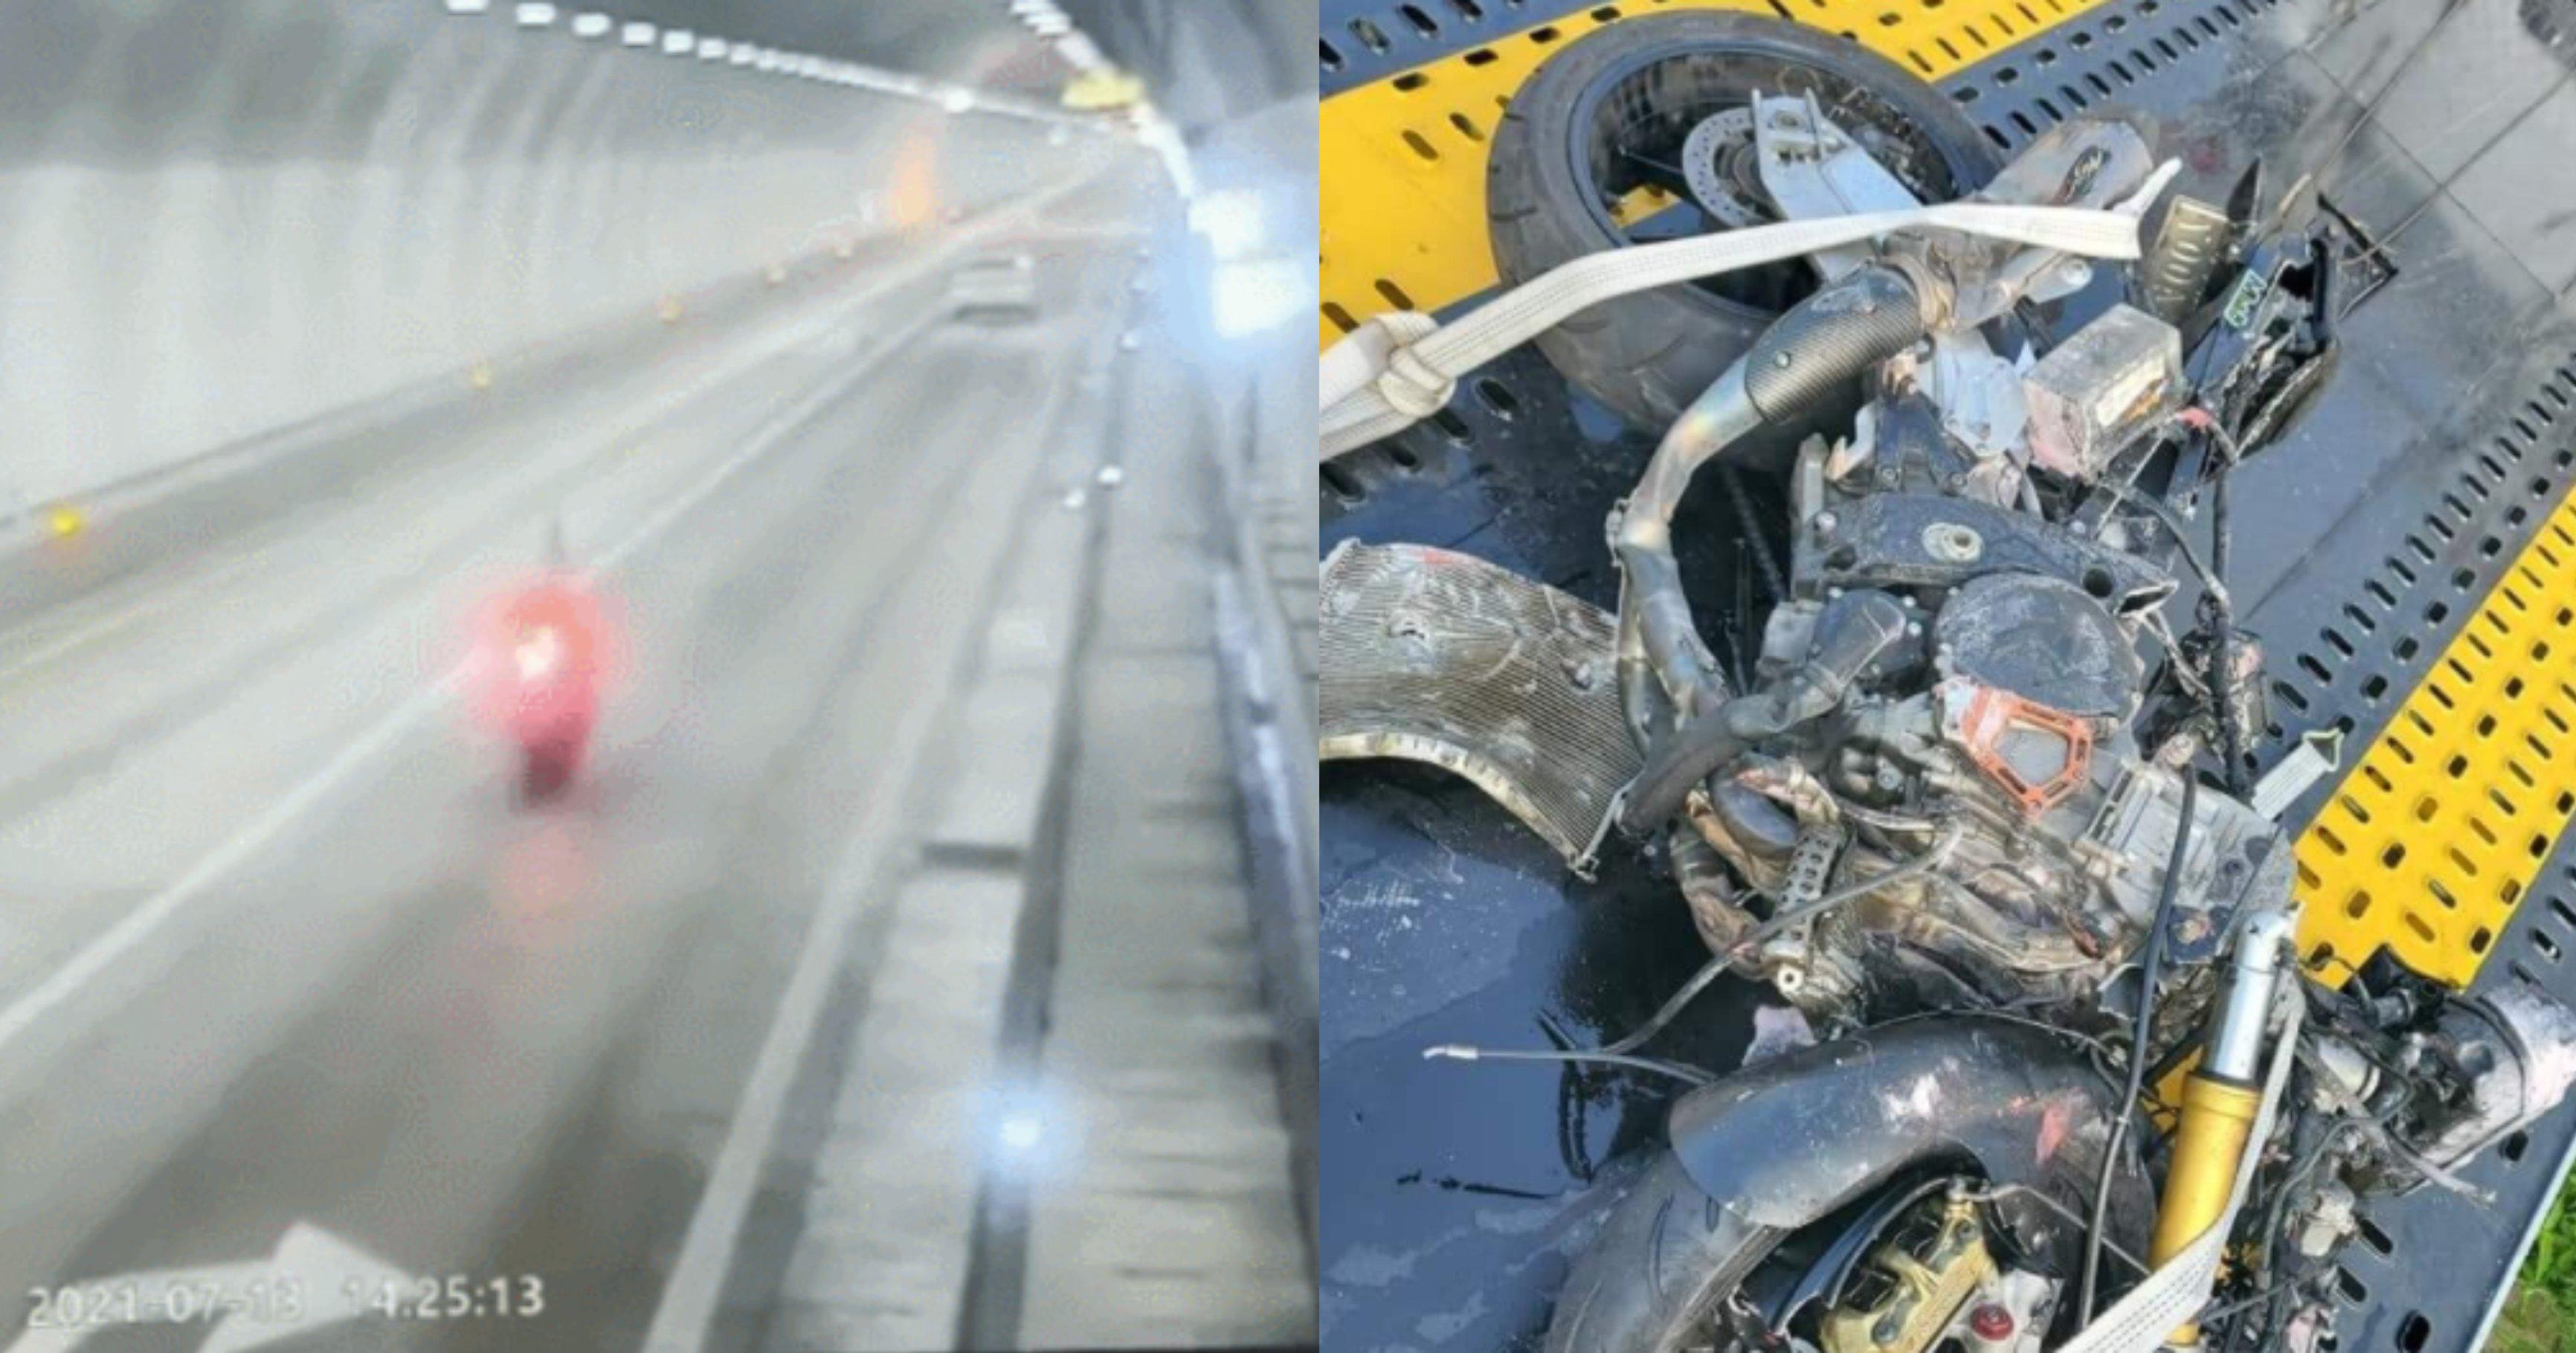 img 197dbfbed2f9 1.jpeg?resize=1200,630 - 최근 미시령에서 벌어진 오토바이 사고 블랙박스 사진